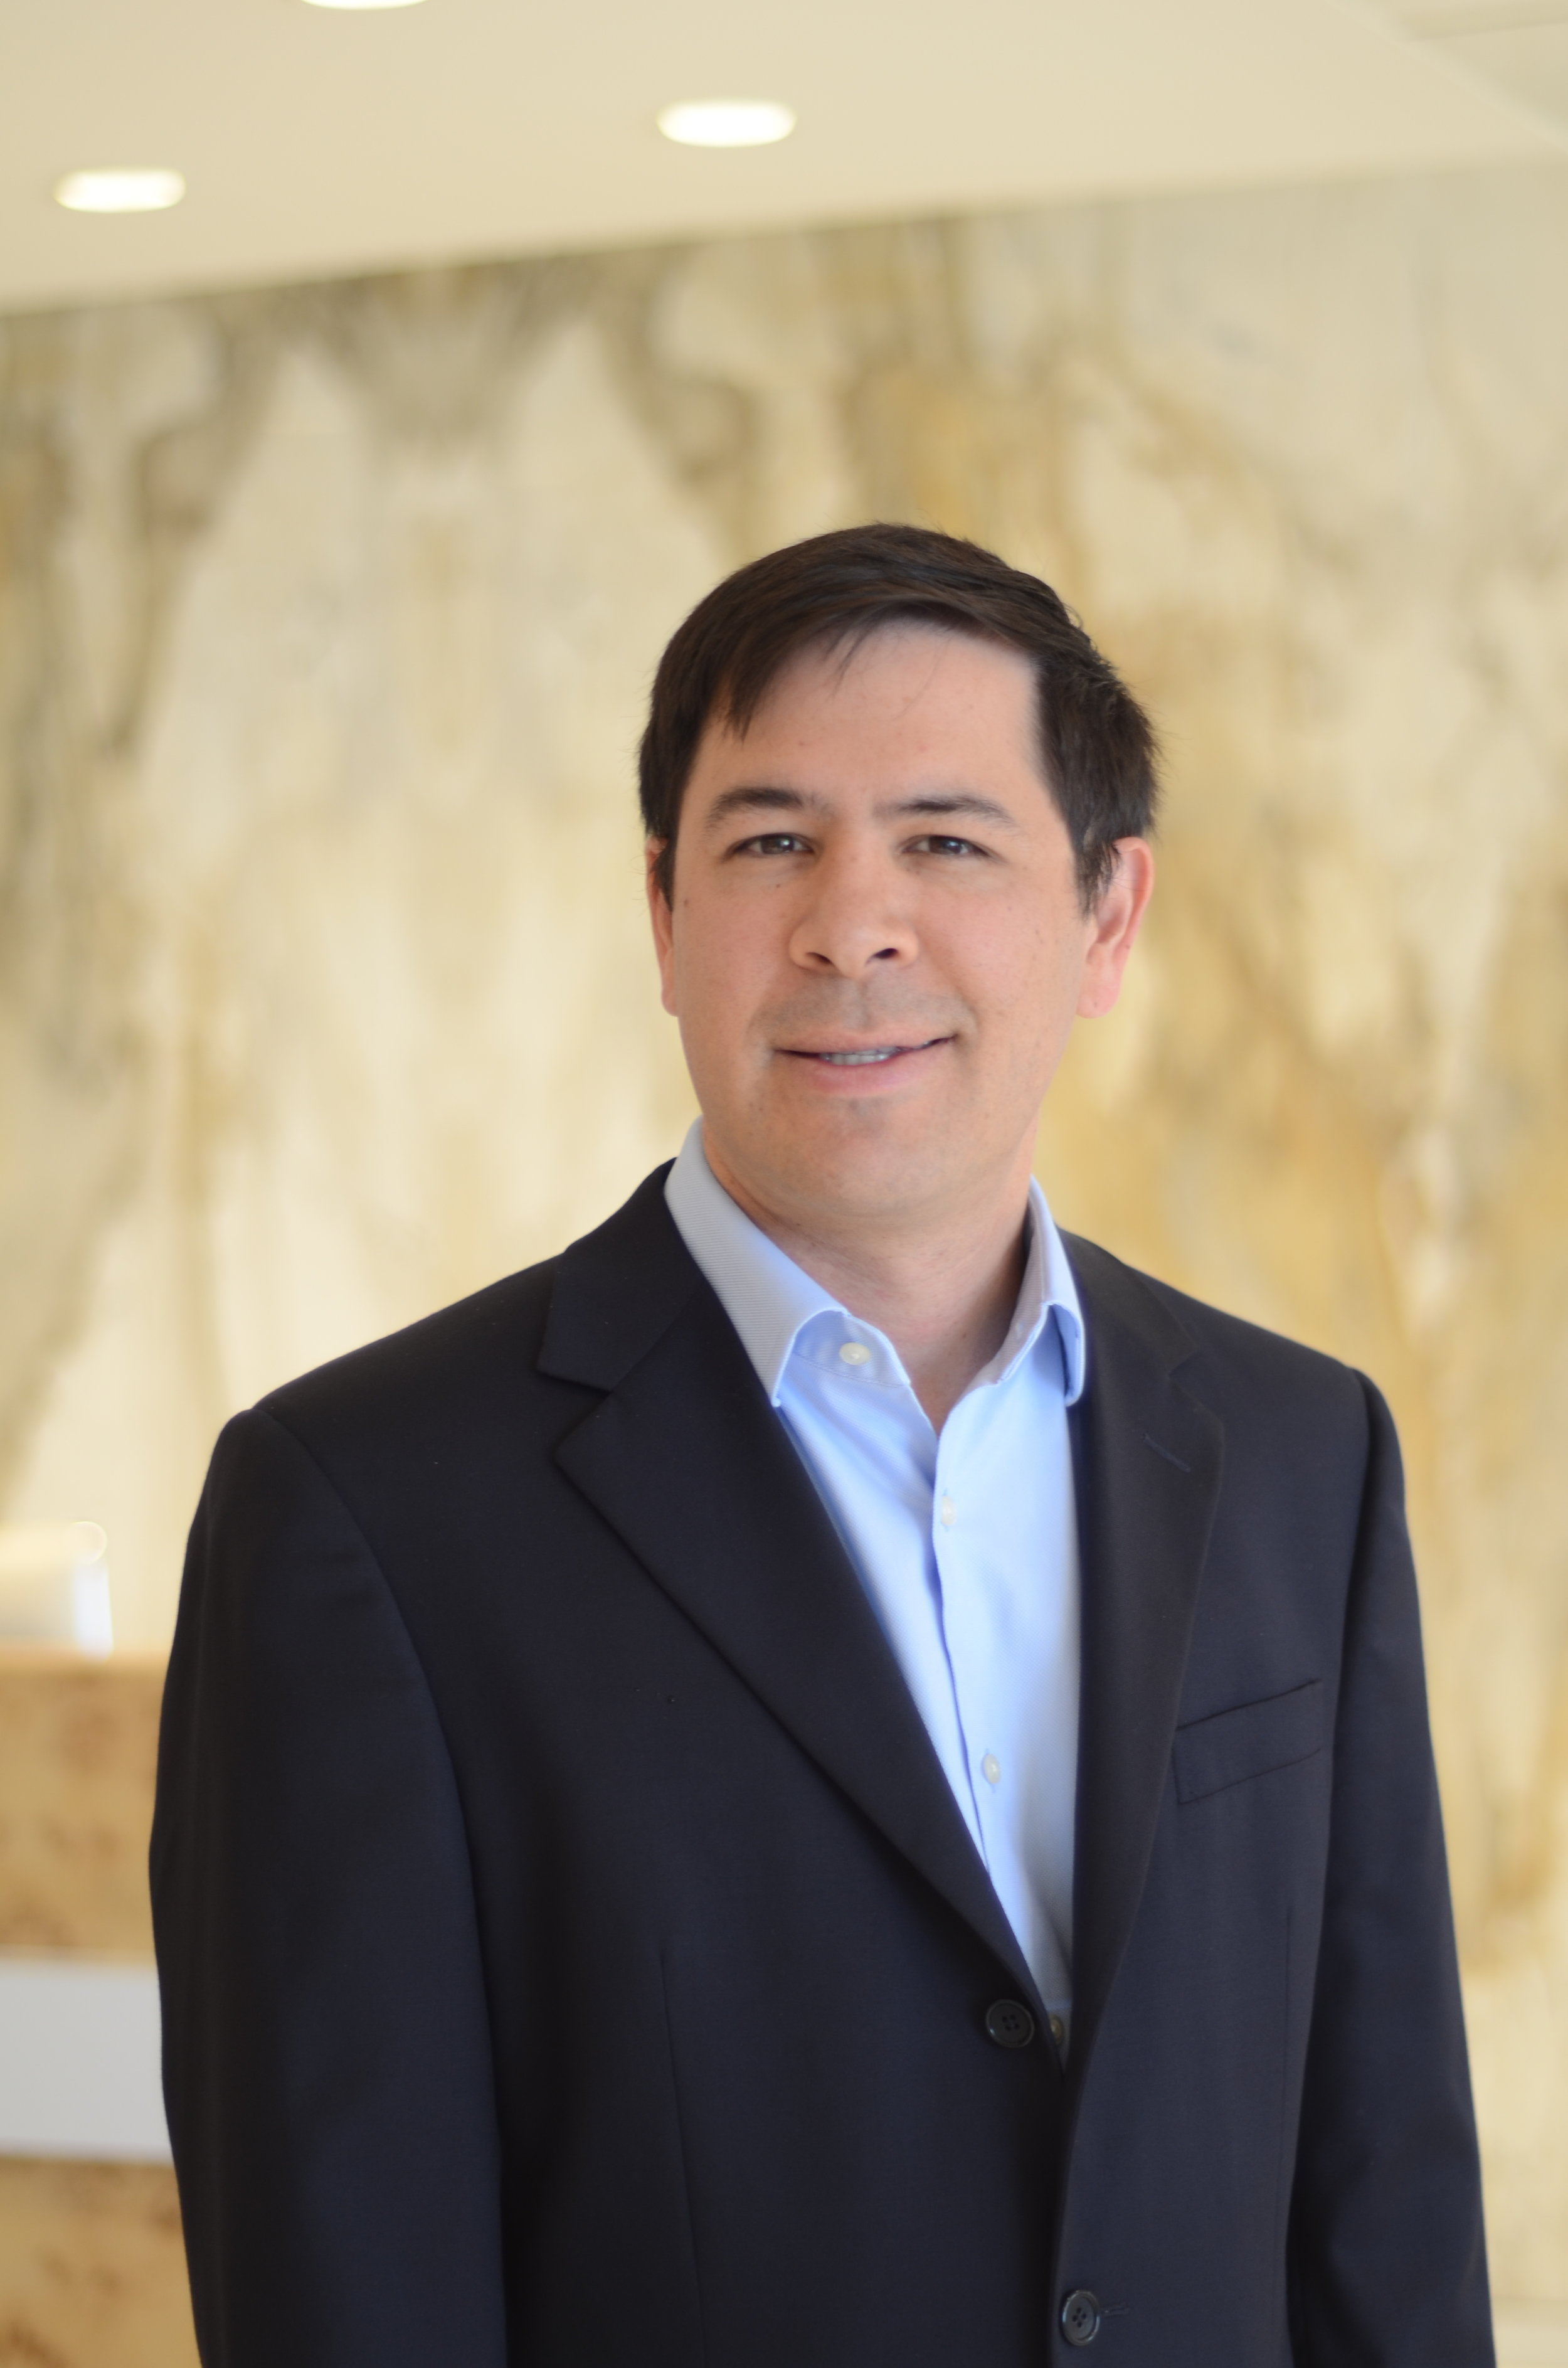 Matt T. | Economics & Biology